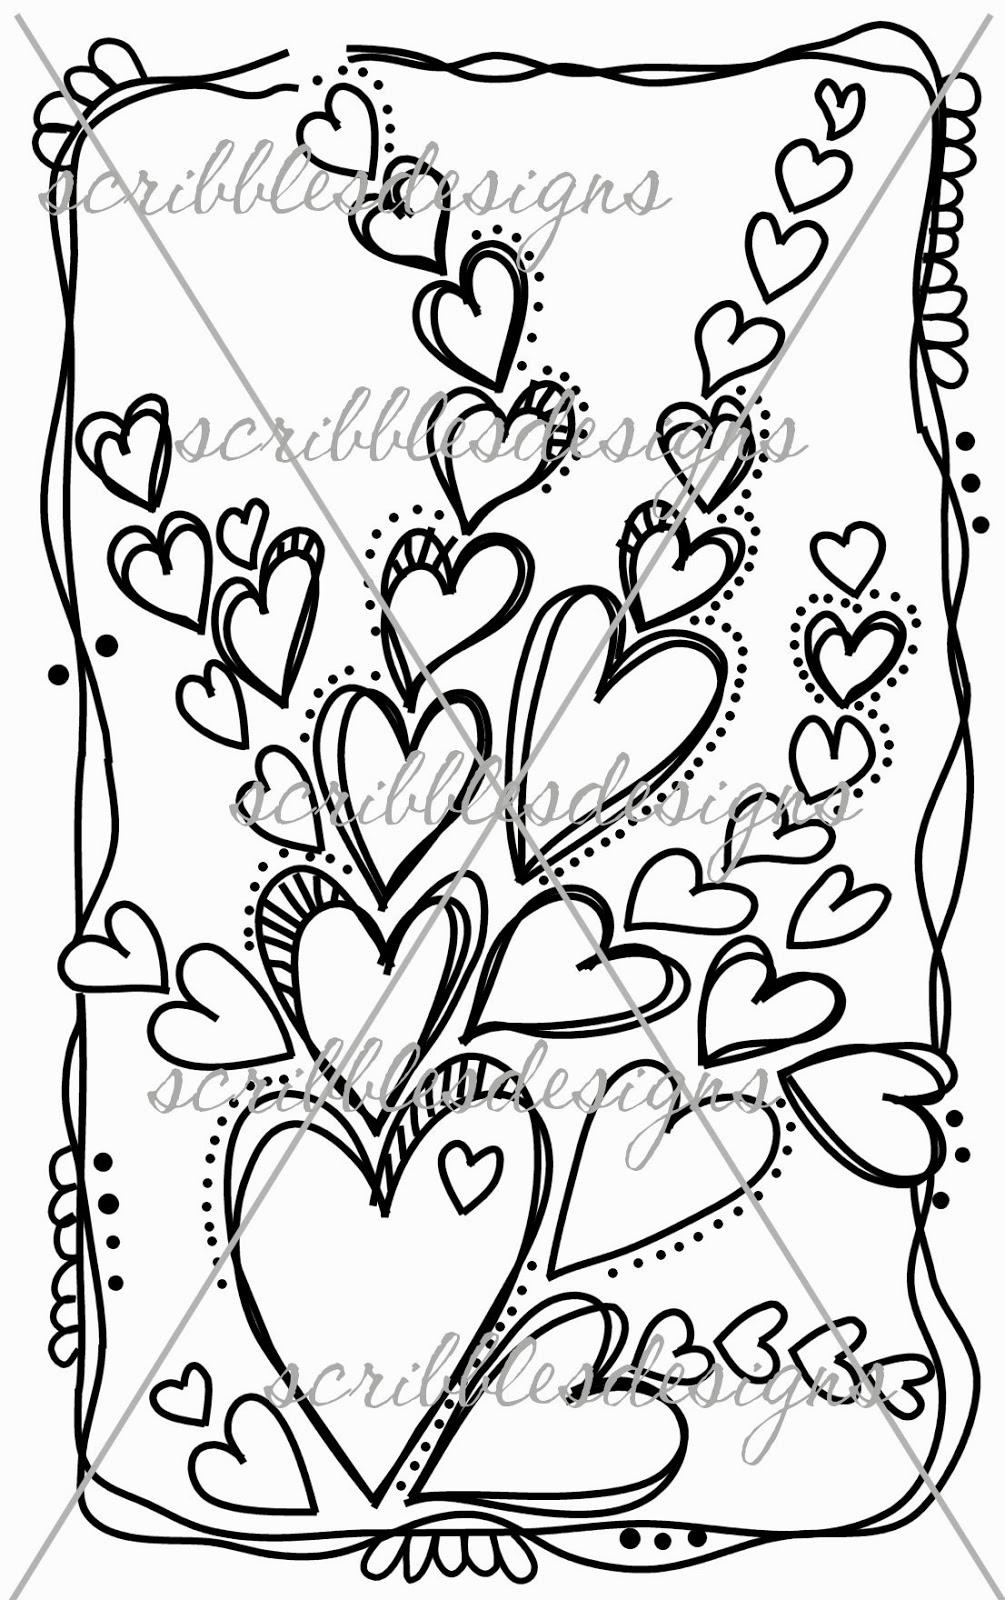 Scribbles Designs: #A 22 Heart Doodle 5 ($3.00)